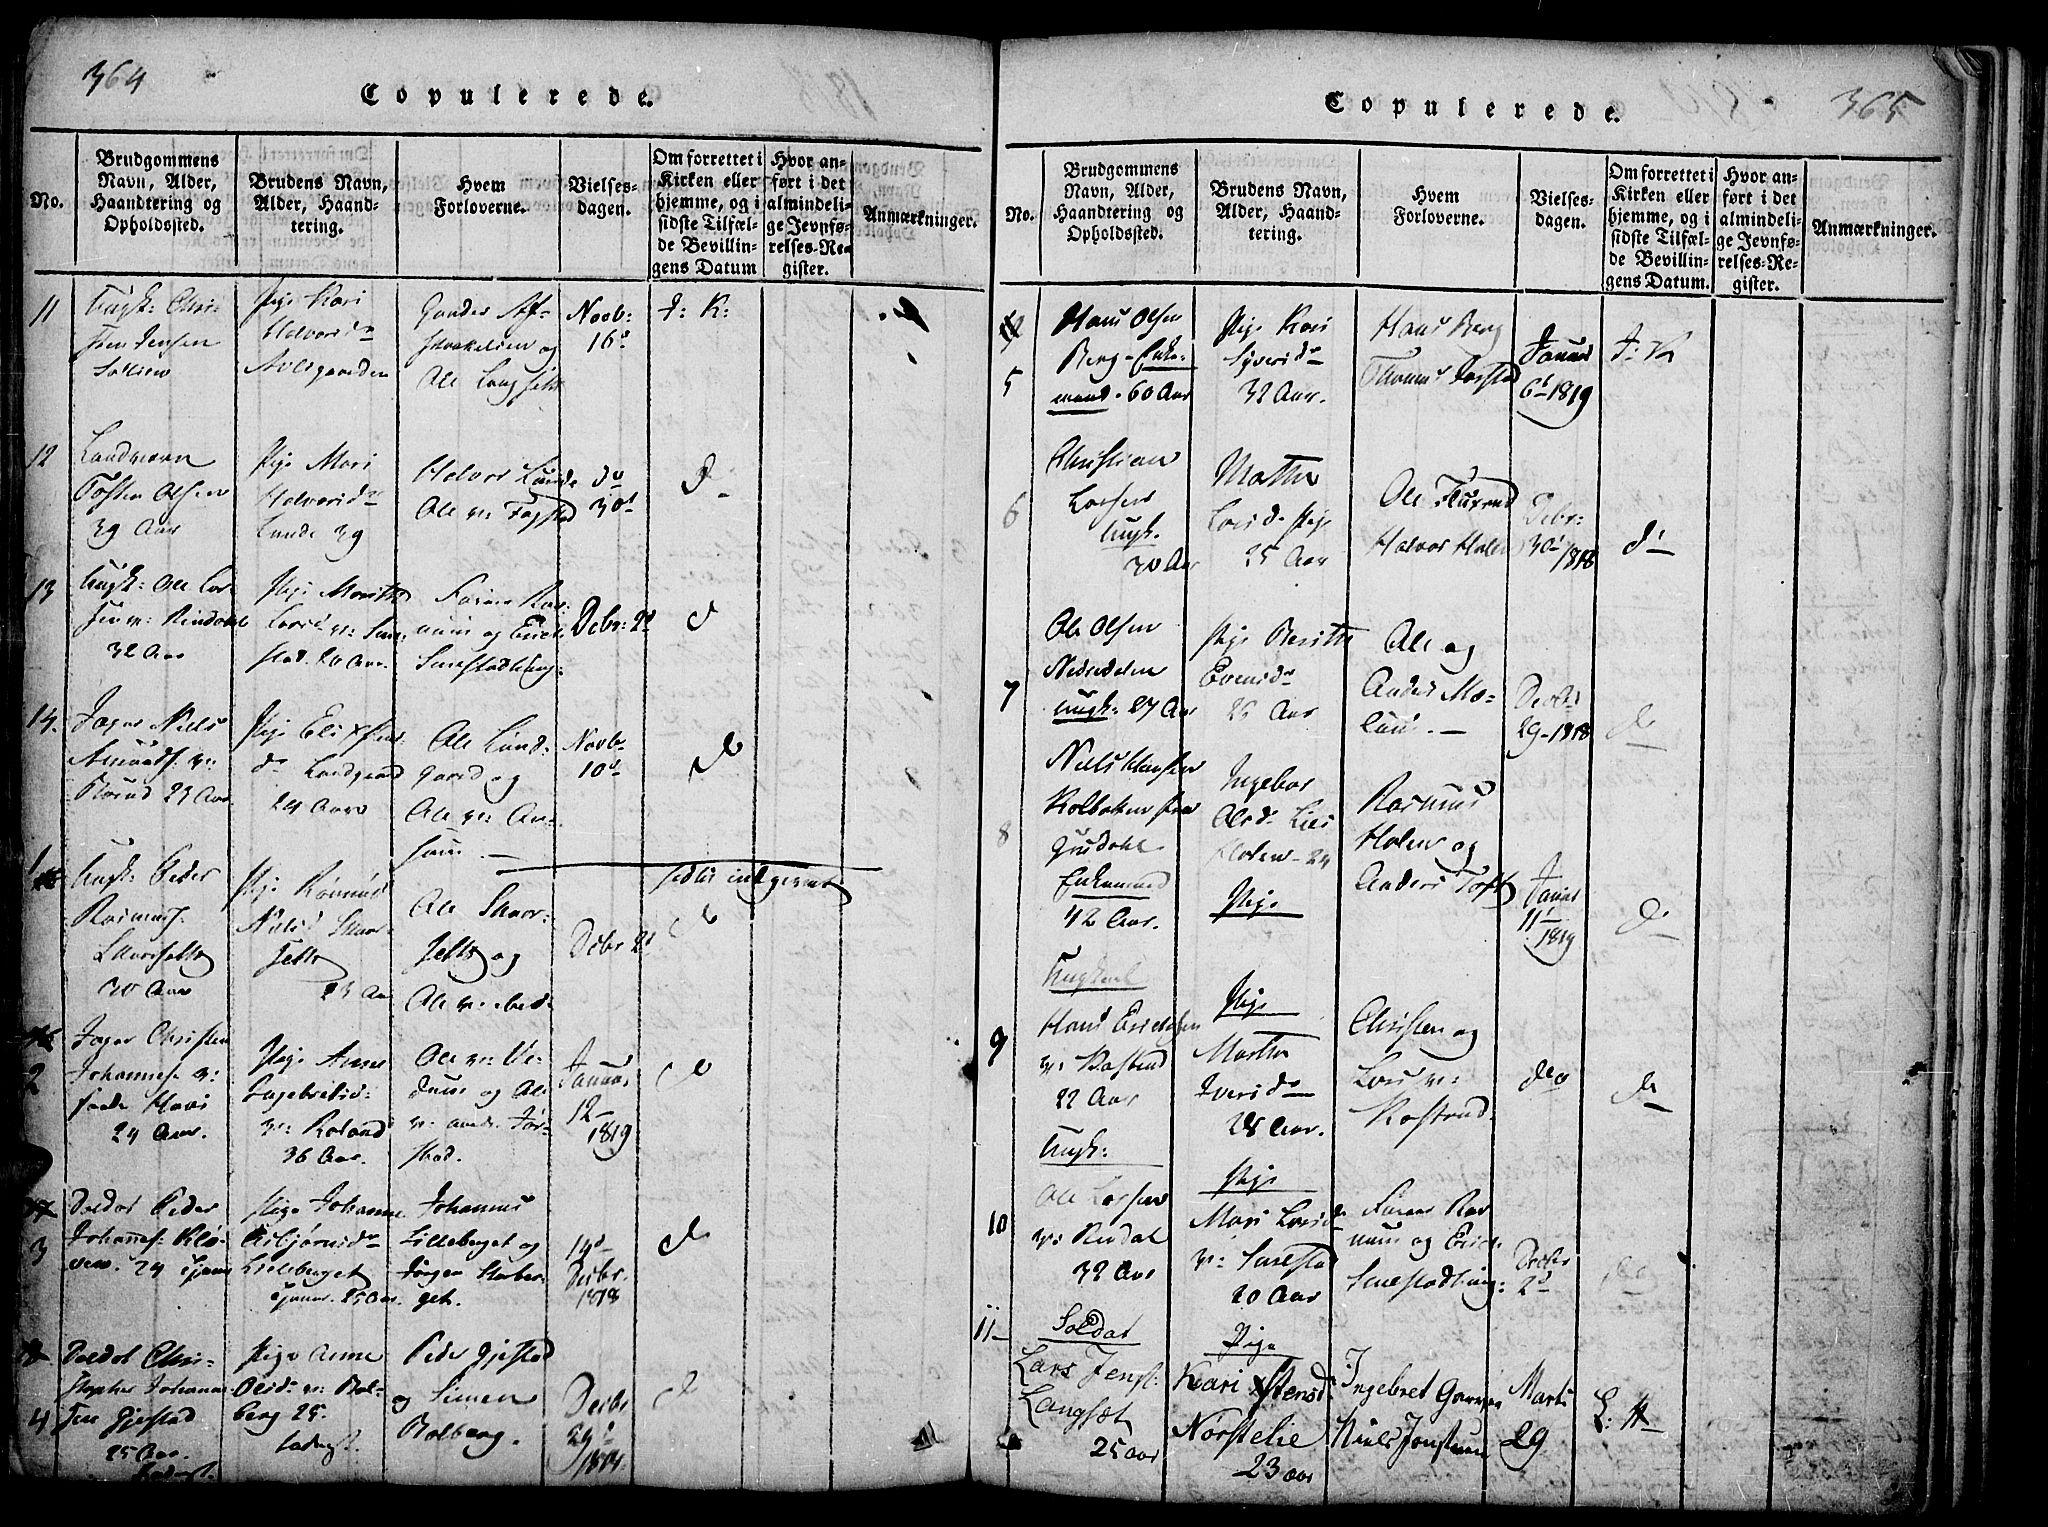 SAH, Fåberg prestekontor, Ministerialbok nr. 3, 1818-1833, s. 364-365